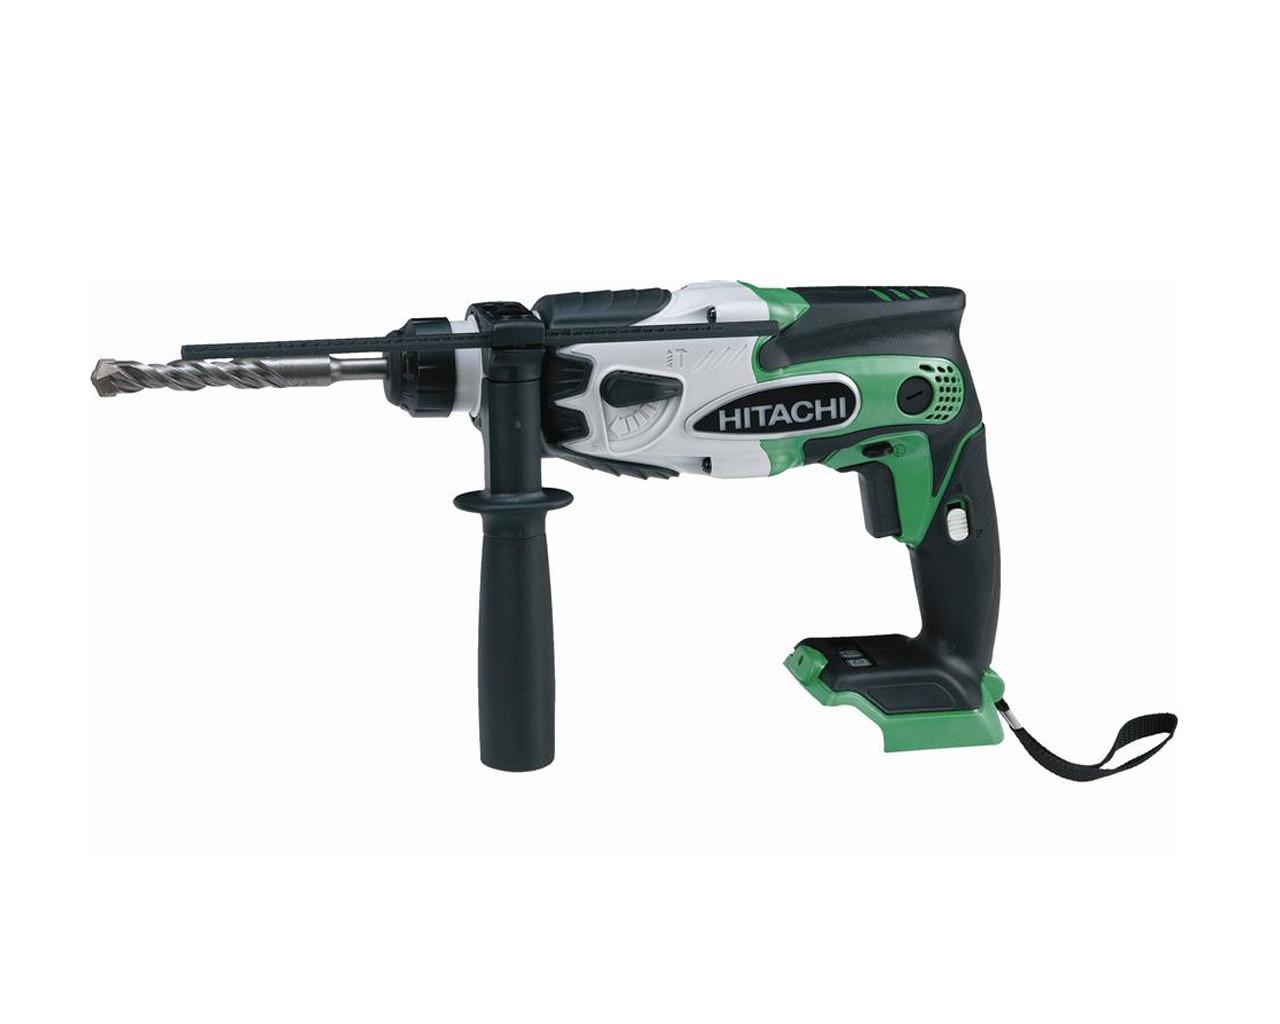 Hitachi Dh18dsl H4 Rotary Hammer Drill 18v Skin Only